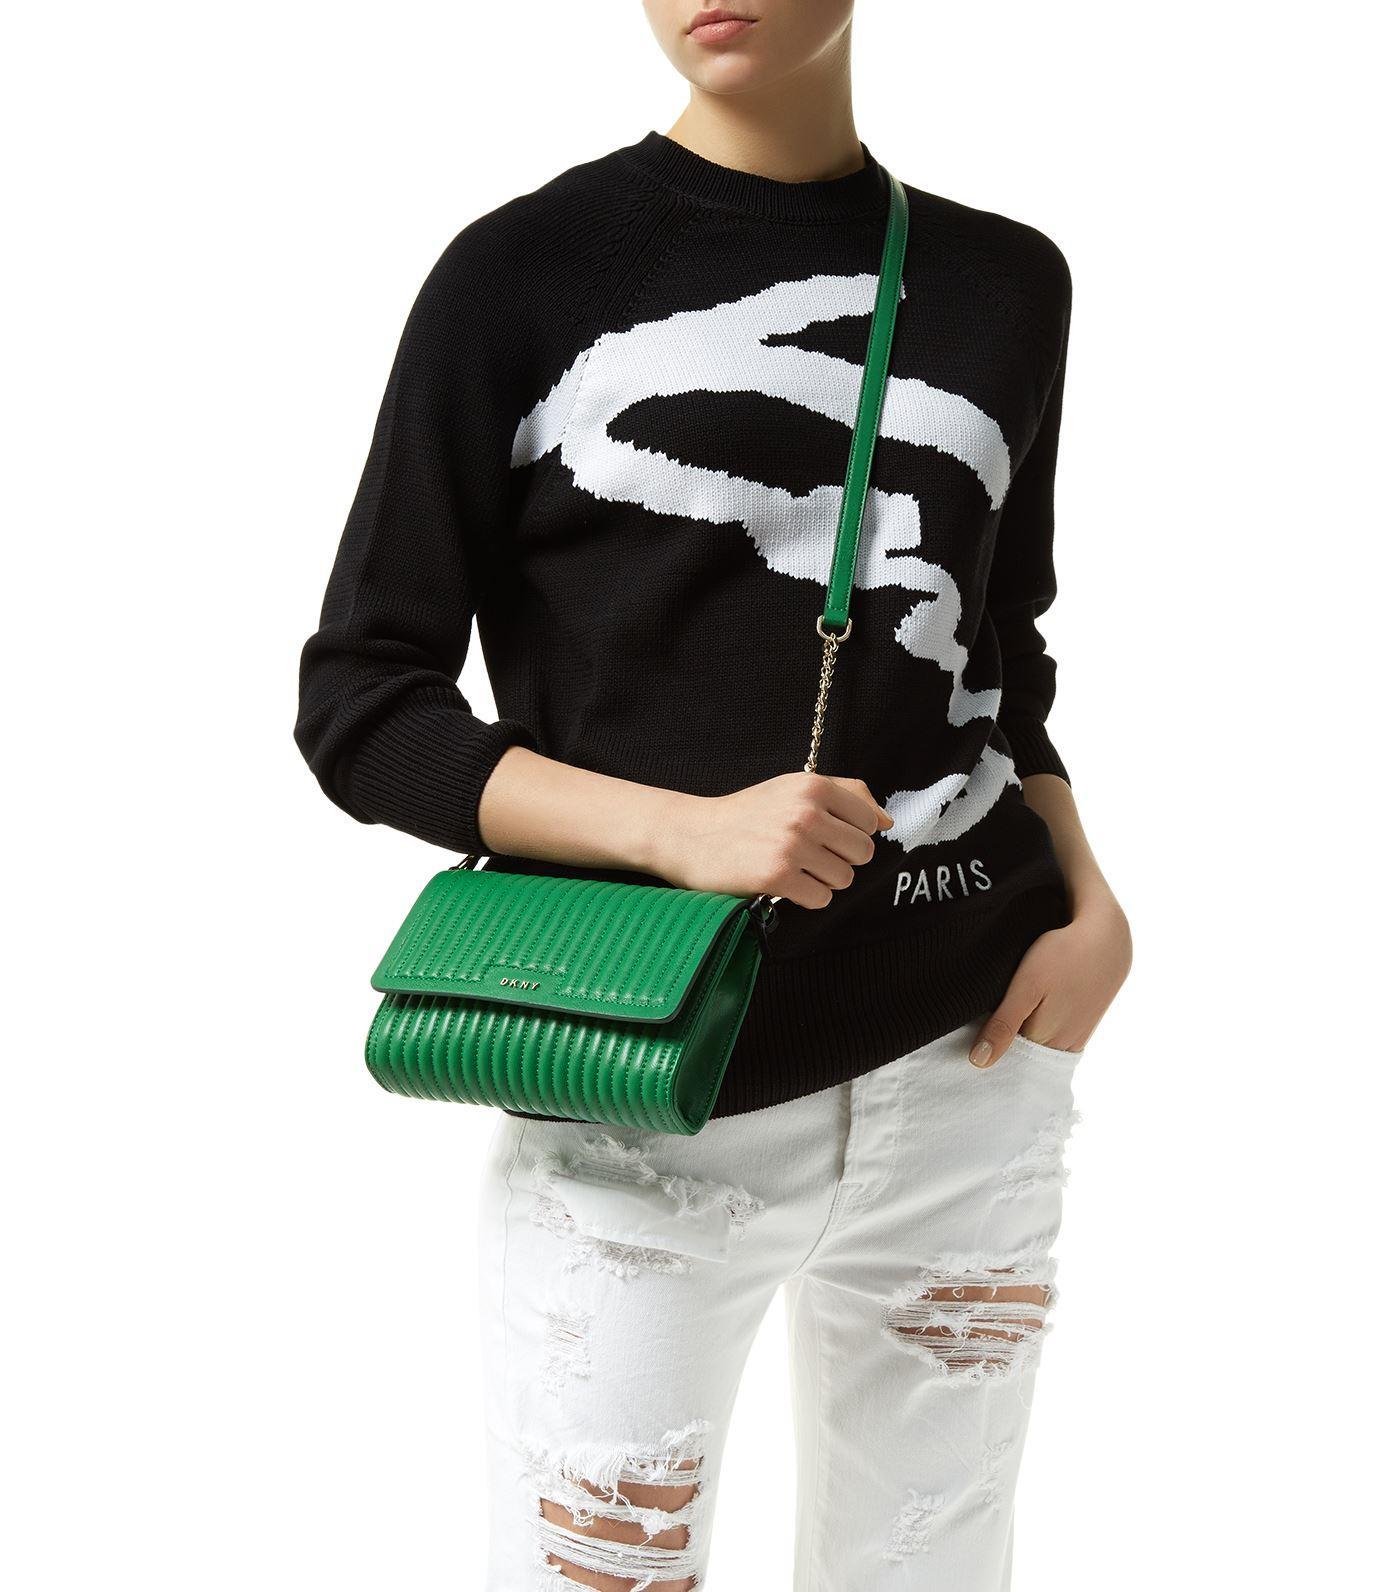 DKNY Leather Gansevoort Cross Body Bag in Ivory (White)